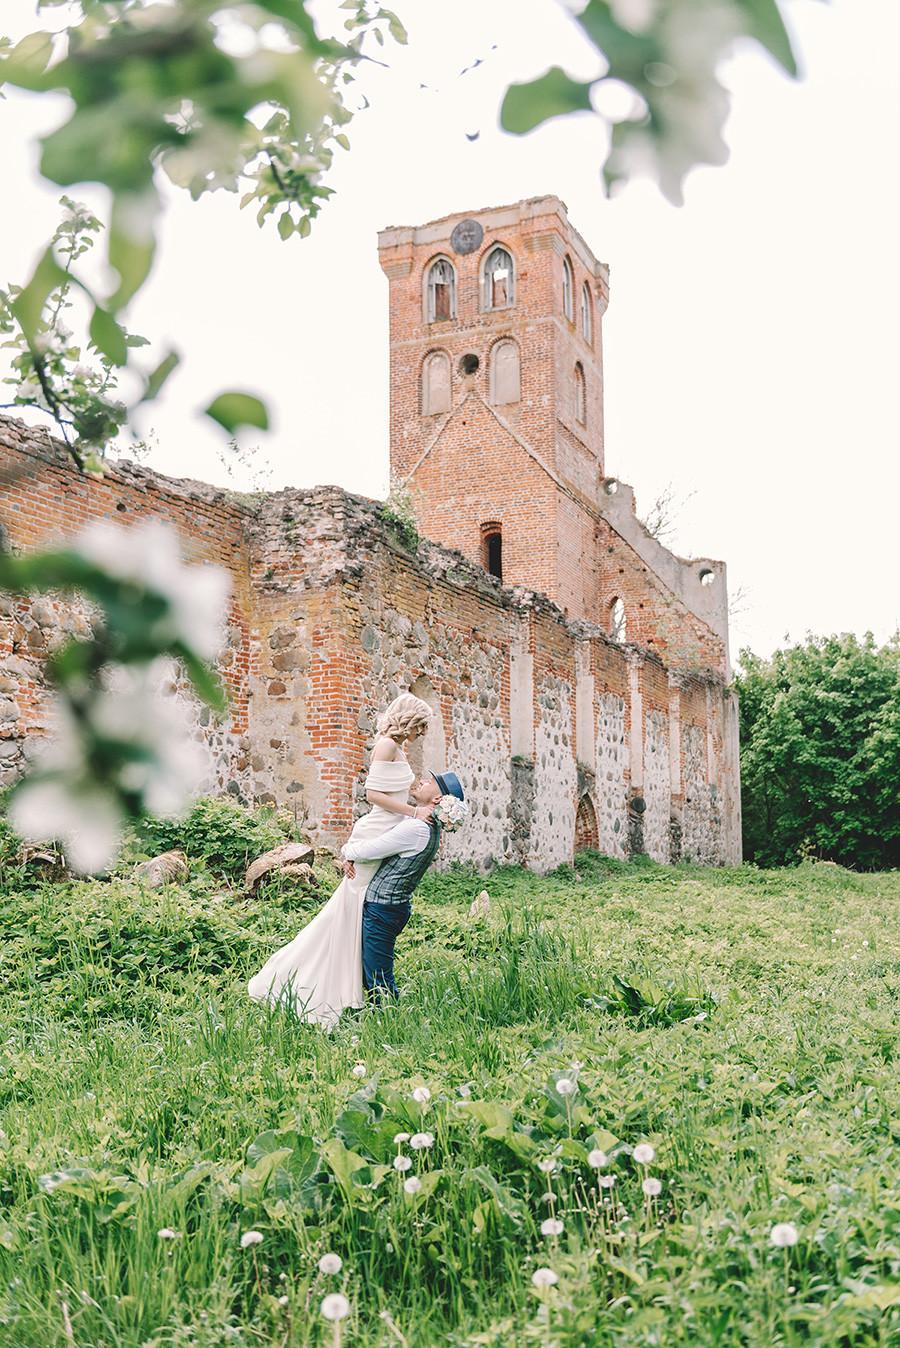 Wedding at Khrabrovo